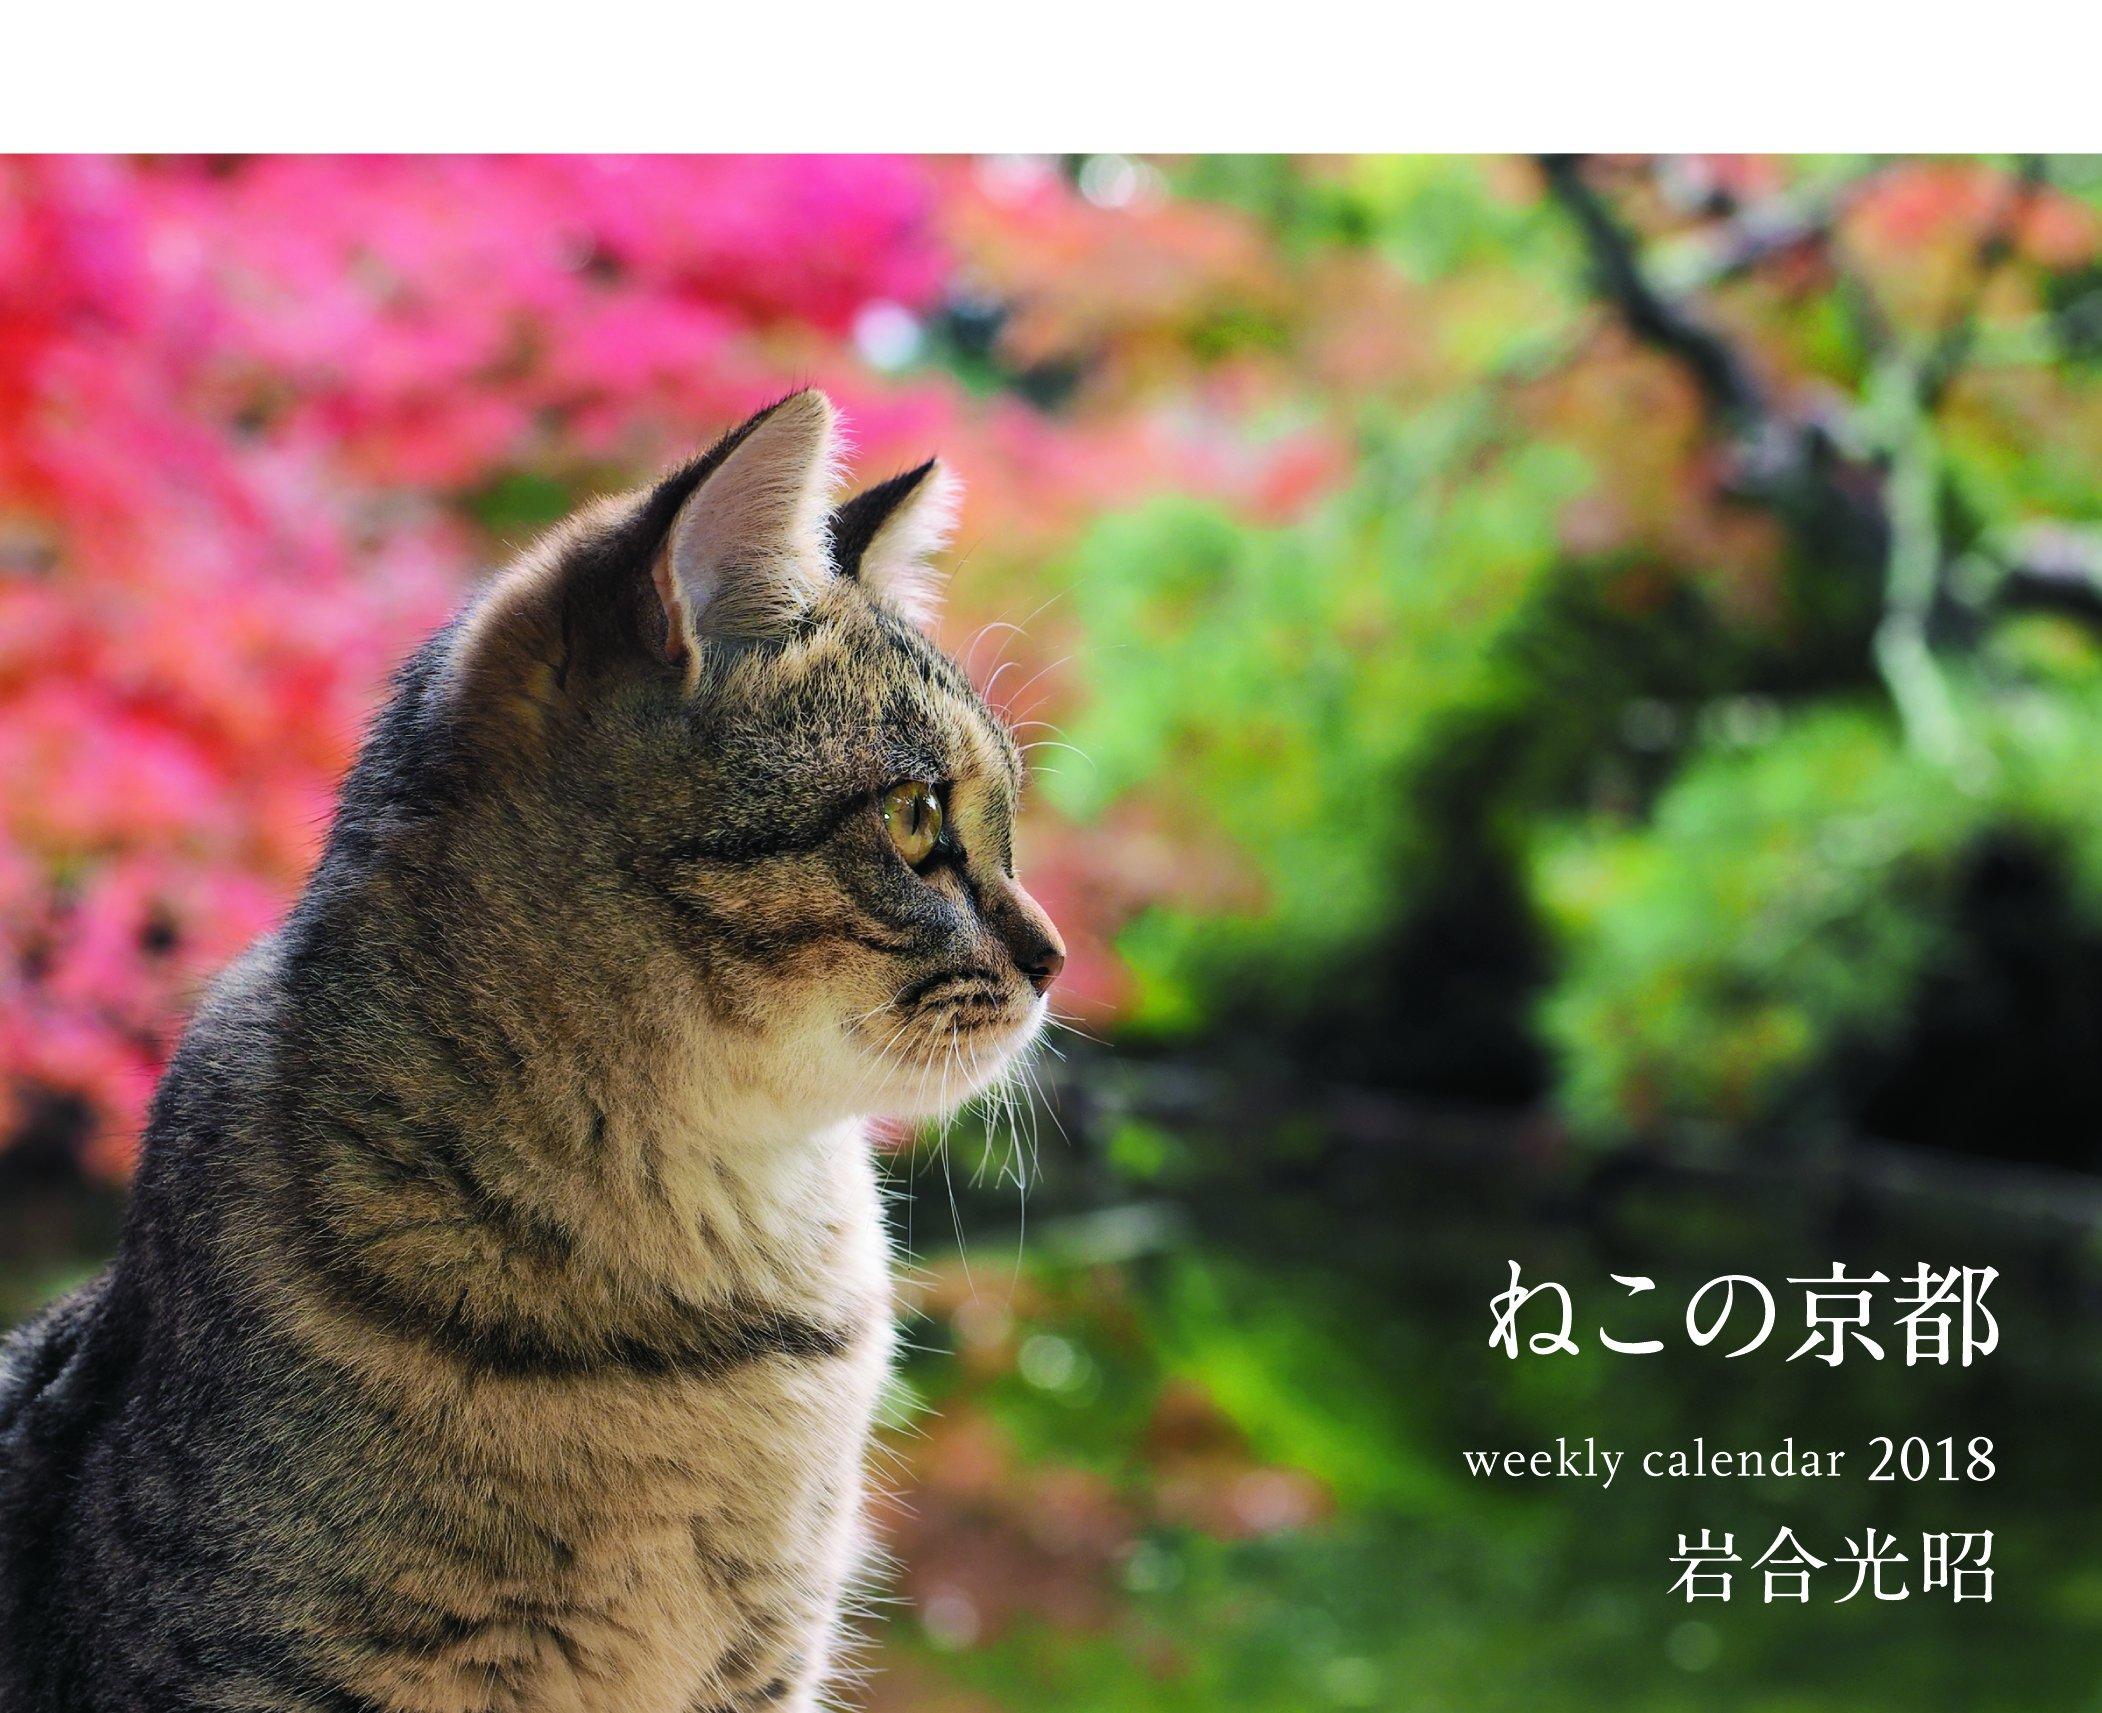 Iwago Mitsuaki cats calendar - Proxy Service - ZenMarket